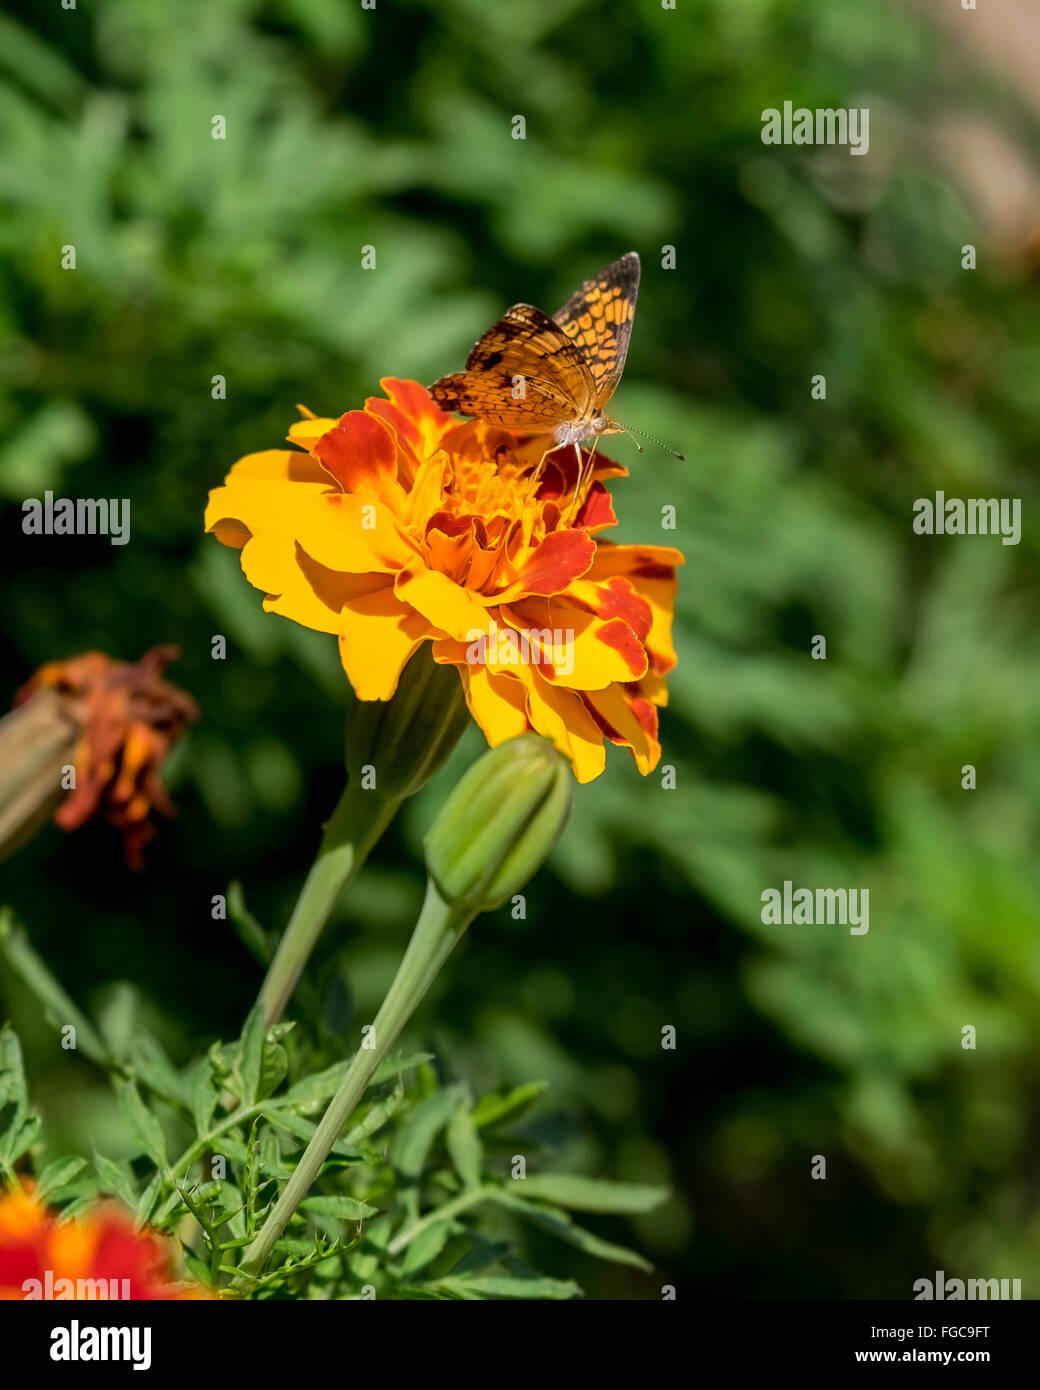 Un plateado Checkerspot butterfly, Chlosyne nycteis, en francés Las Caléndulas, Tagetes Petula. Oklahoma, EE.UU. Foto de stock